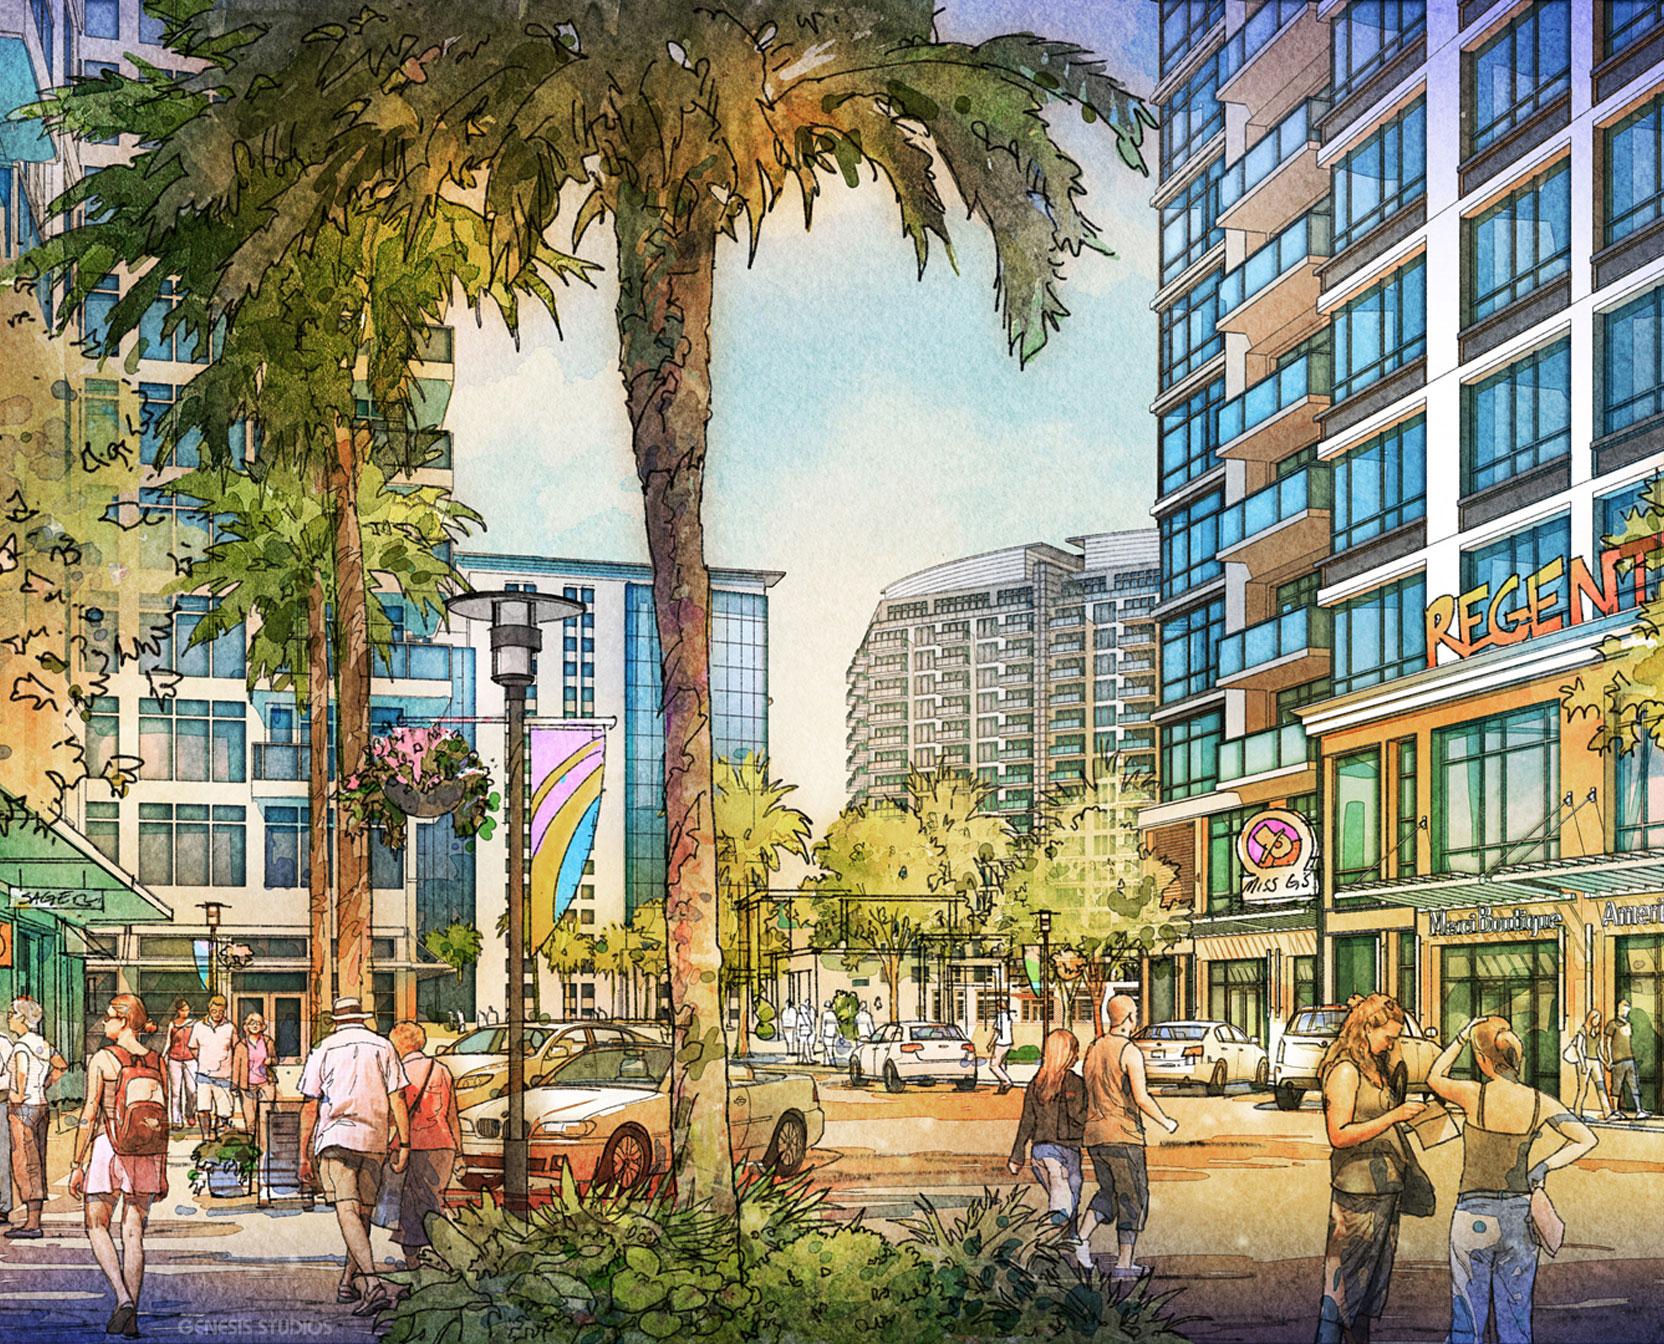 616067- Digital Watercolor Architectural Rendering of Sarasota Quay for Baker Barrios